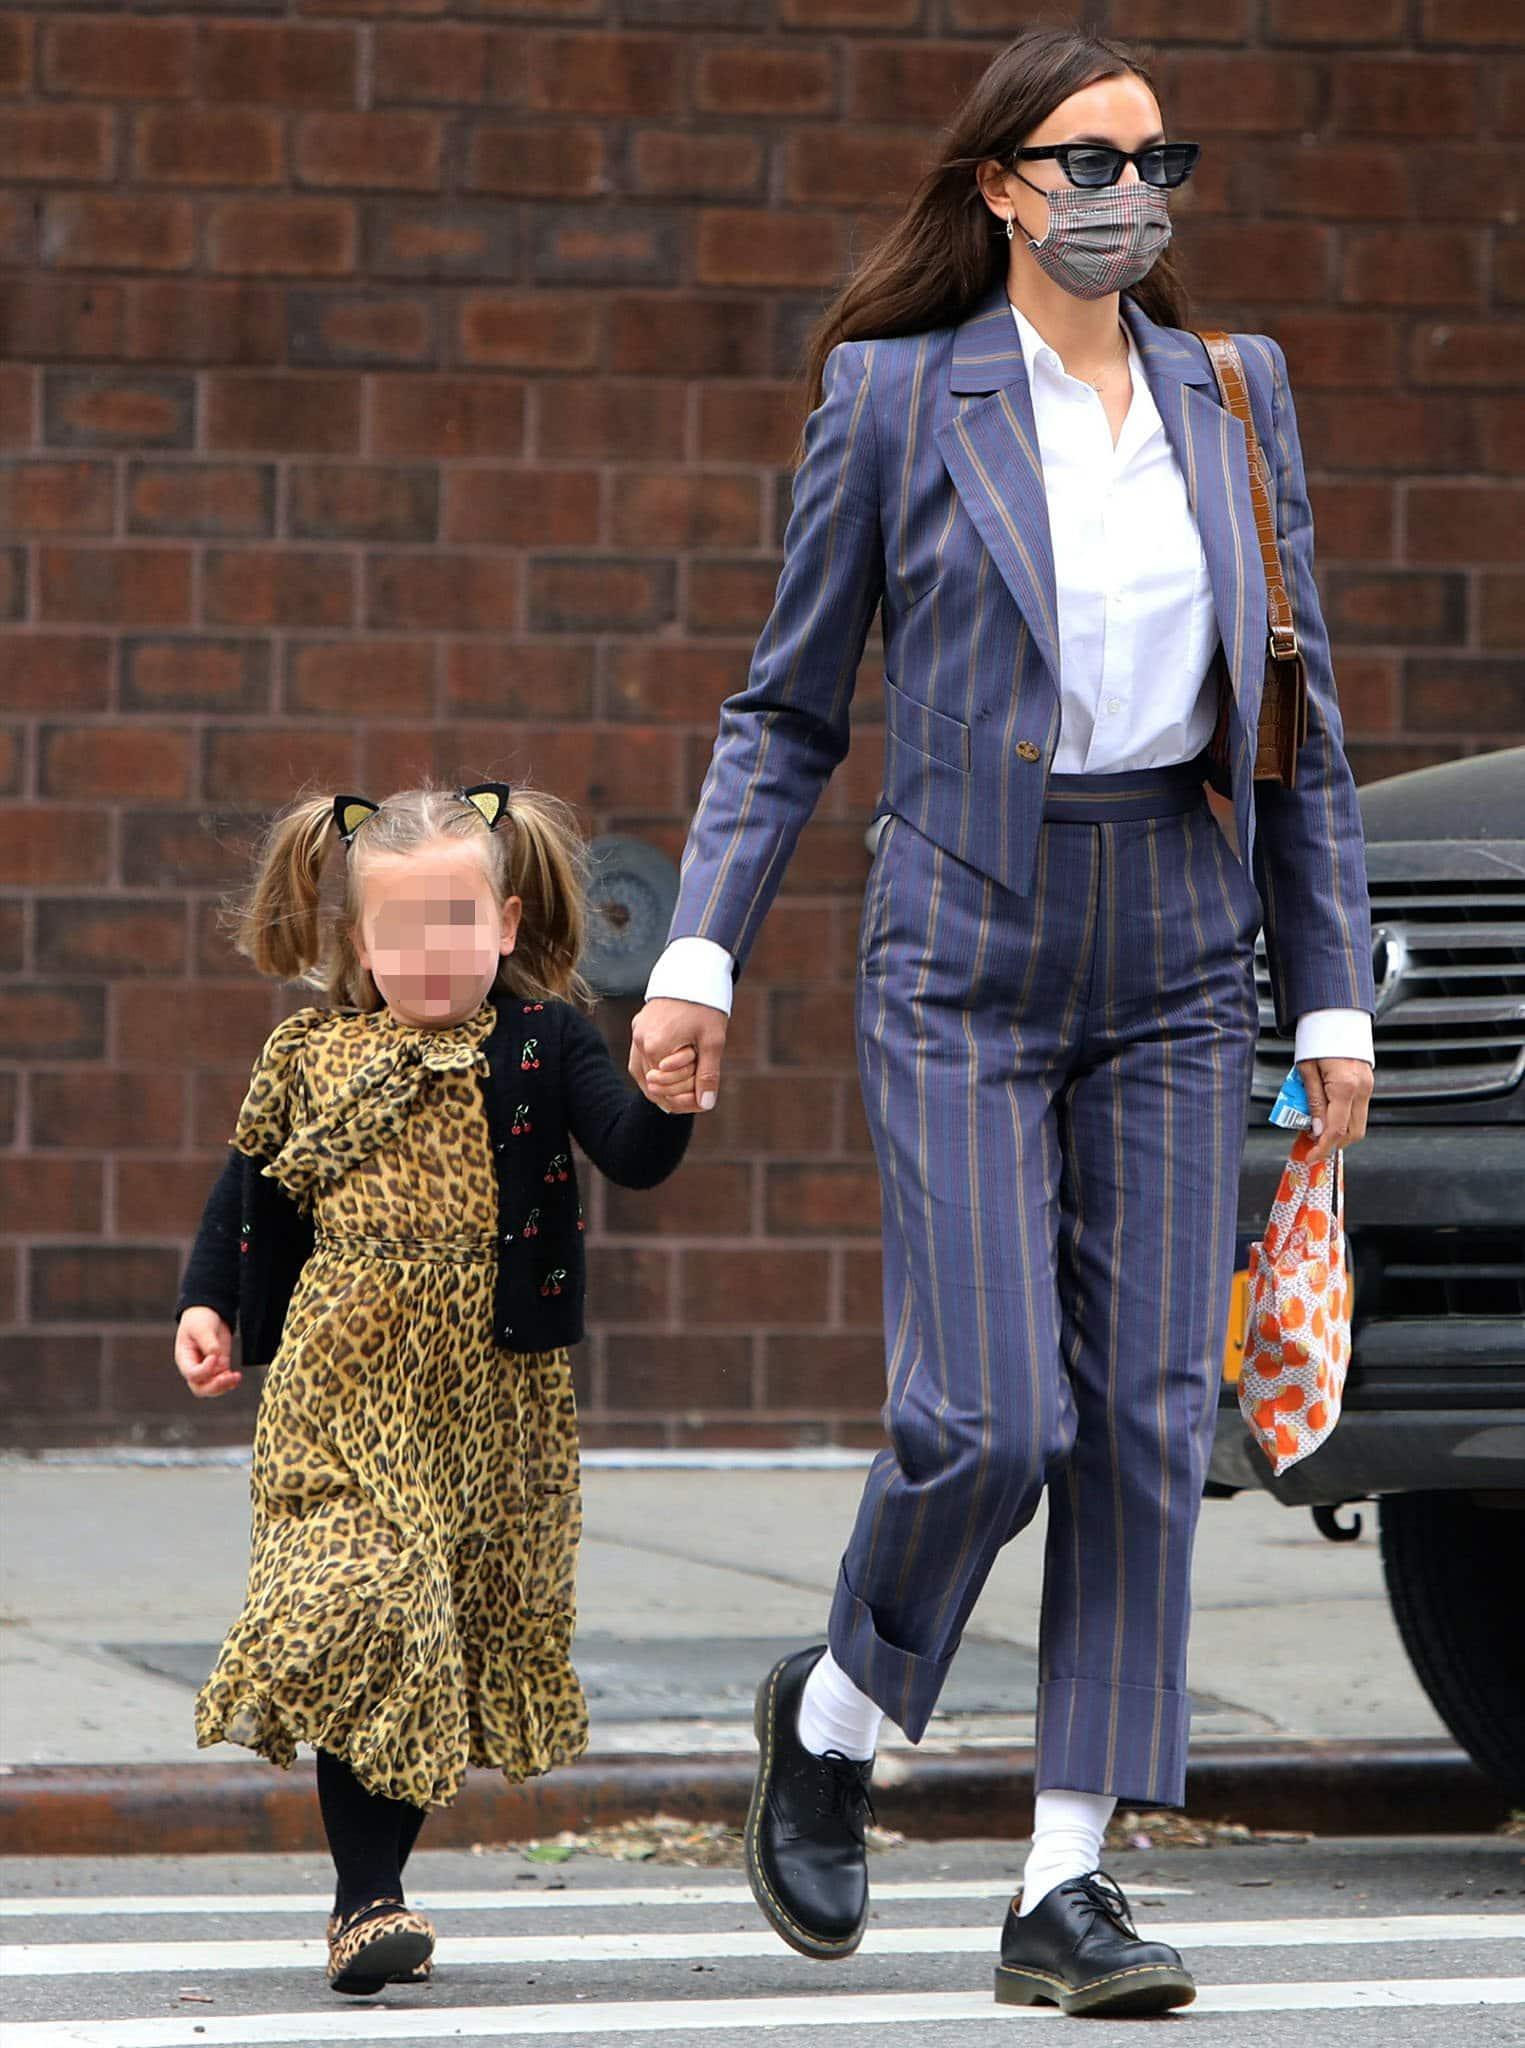 Irina Shayk picks up her daughter Lea from school in New York City on May 3, 2021